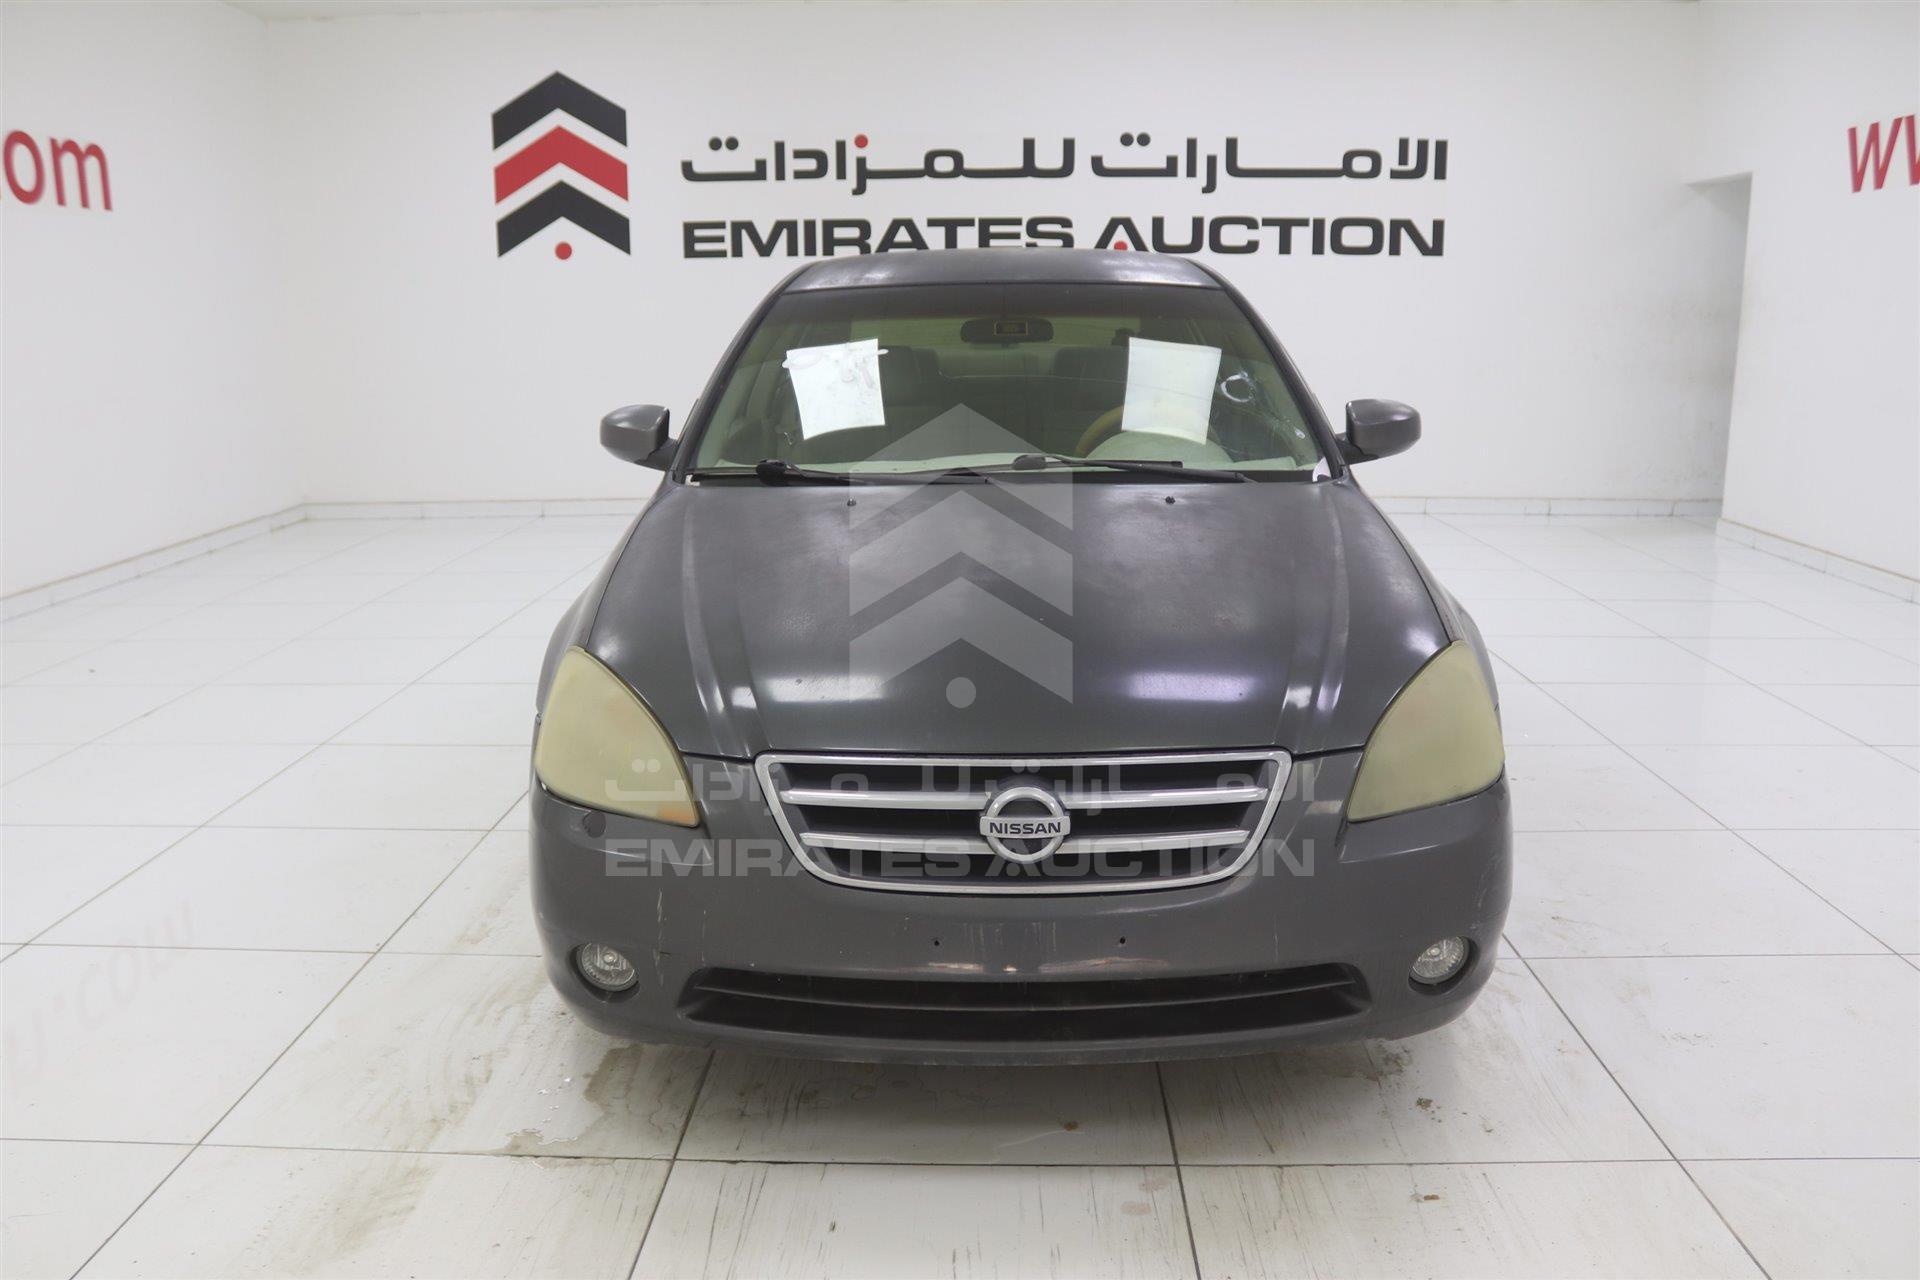 2008 Nissan Altima Source · 2006 Nissan Altima For Sale In UAE 106938